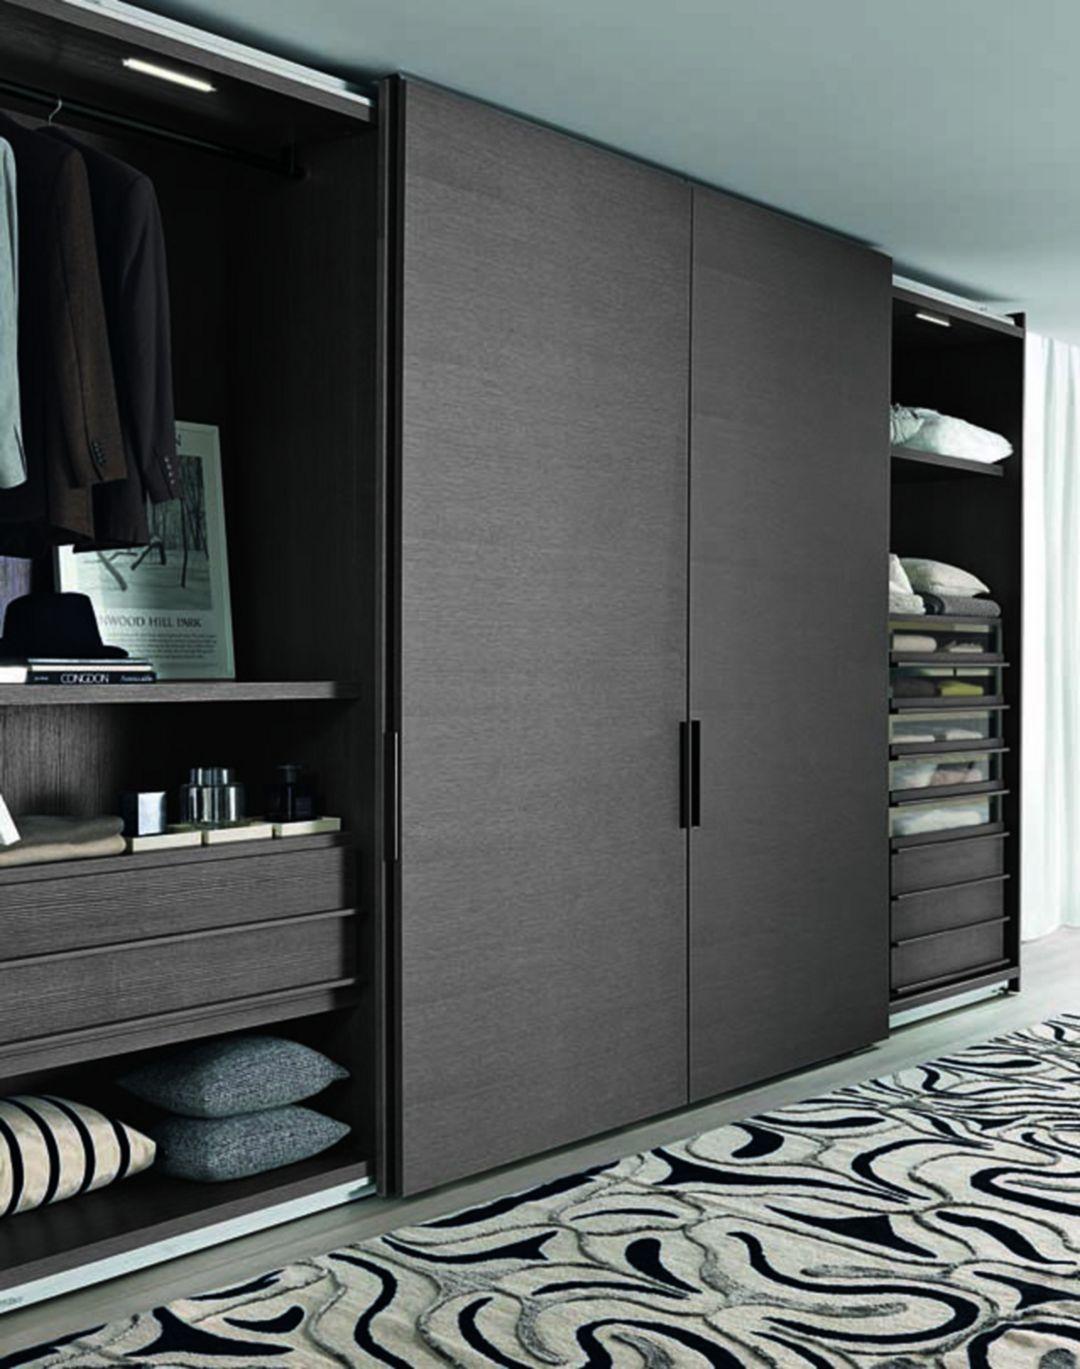 Breathtaking Top 30 Modern Wardrobe Design Ideas For Your Small Bedroom Https Decoor Ne Wardrobe Door Designs Wardrobe Design Modern Bedroom Furniture Design